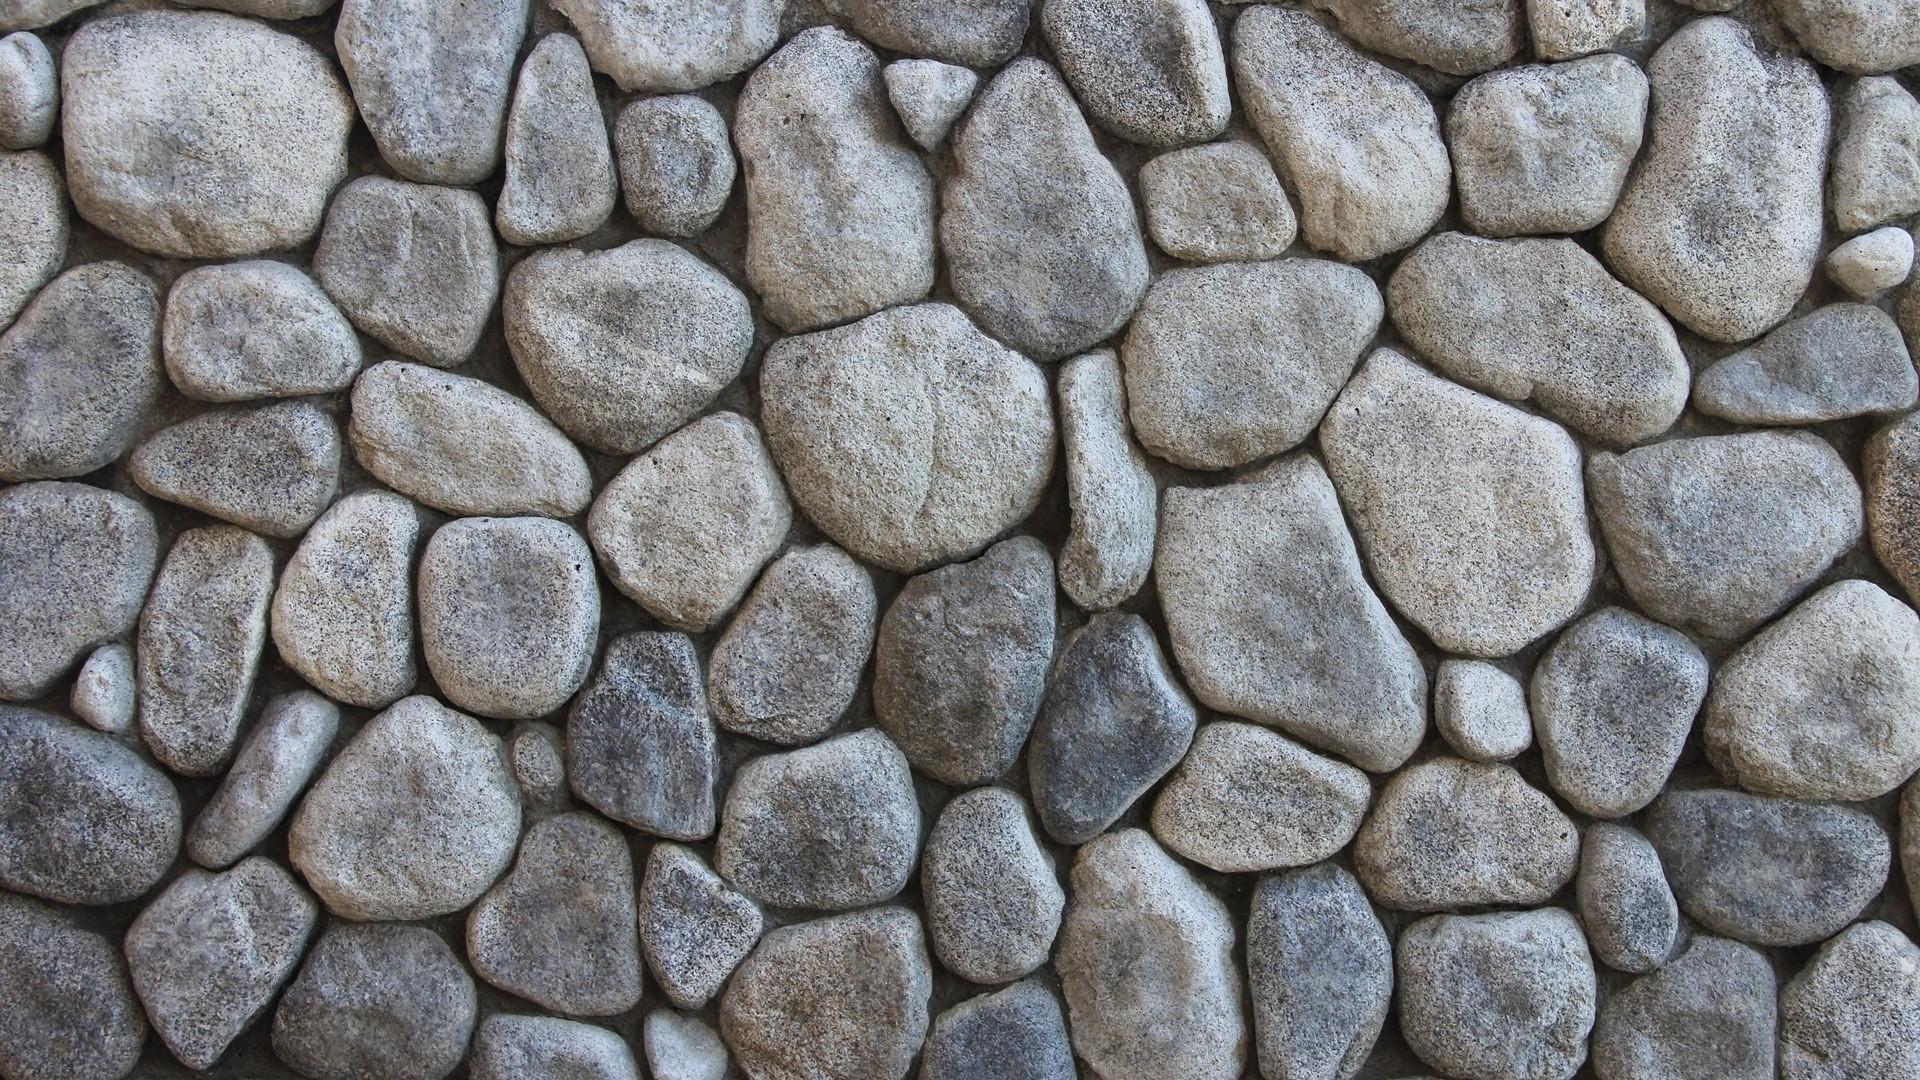 Texture Stone wallpaper photo hd